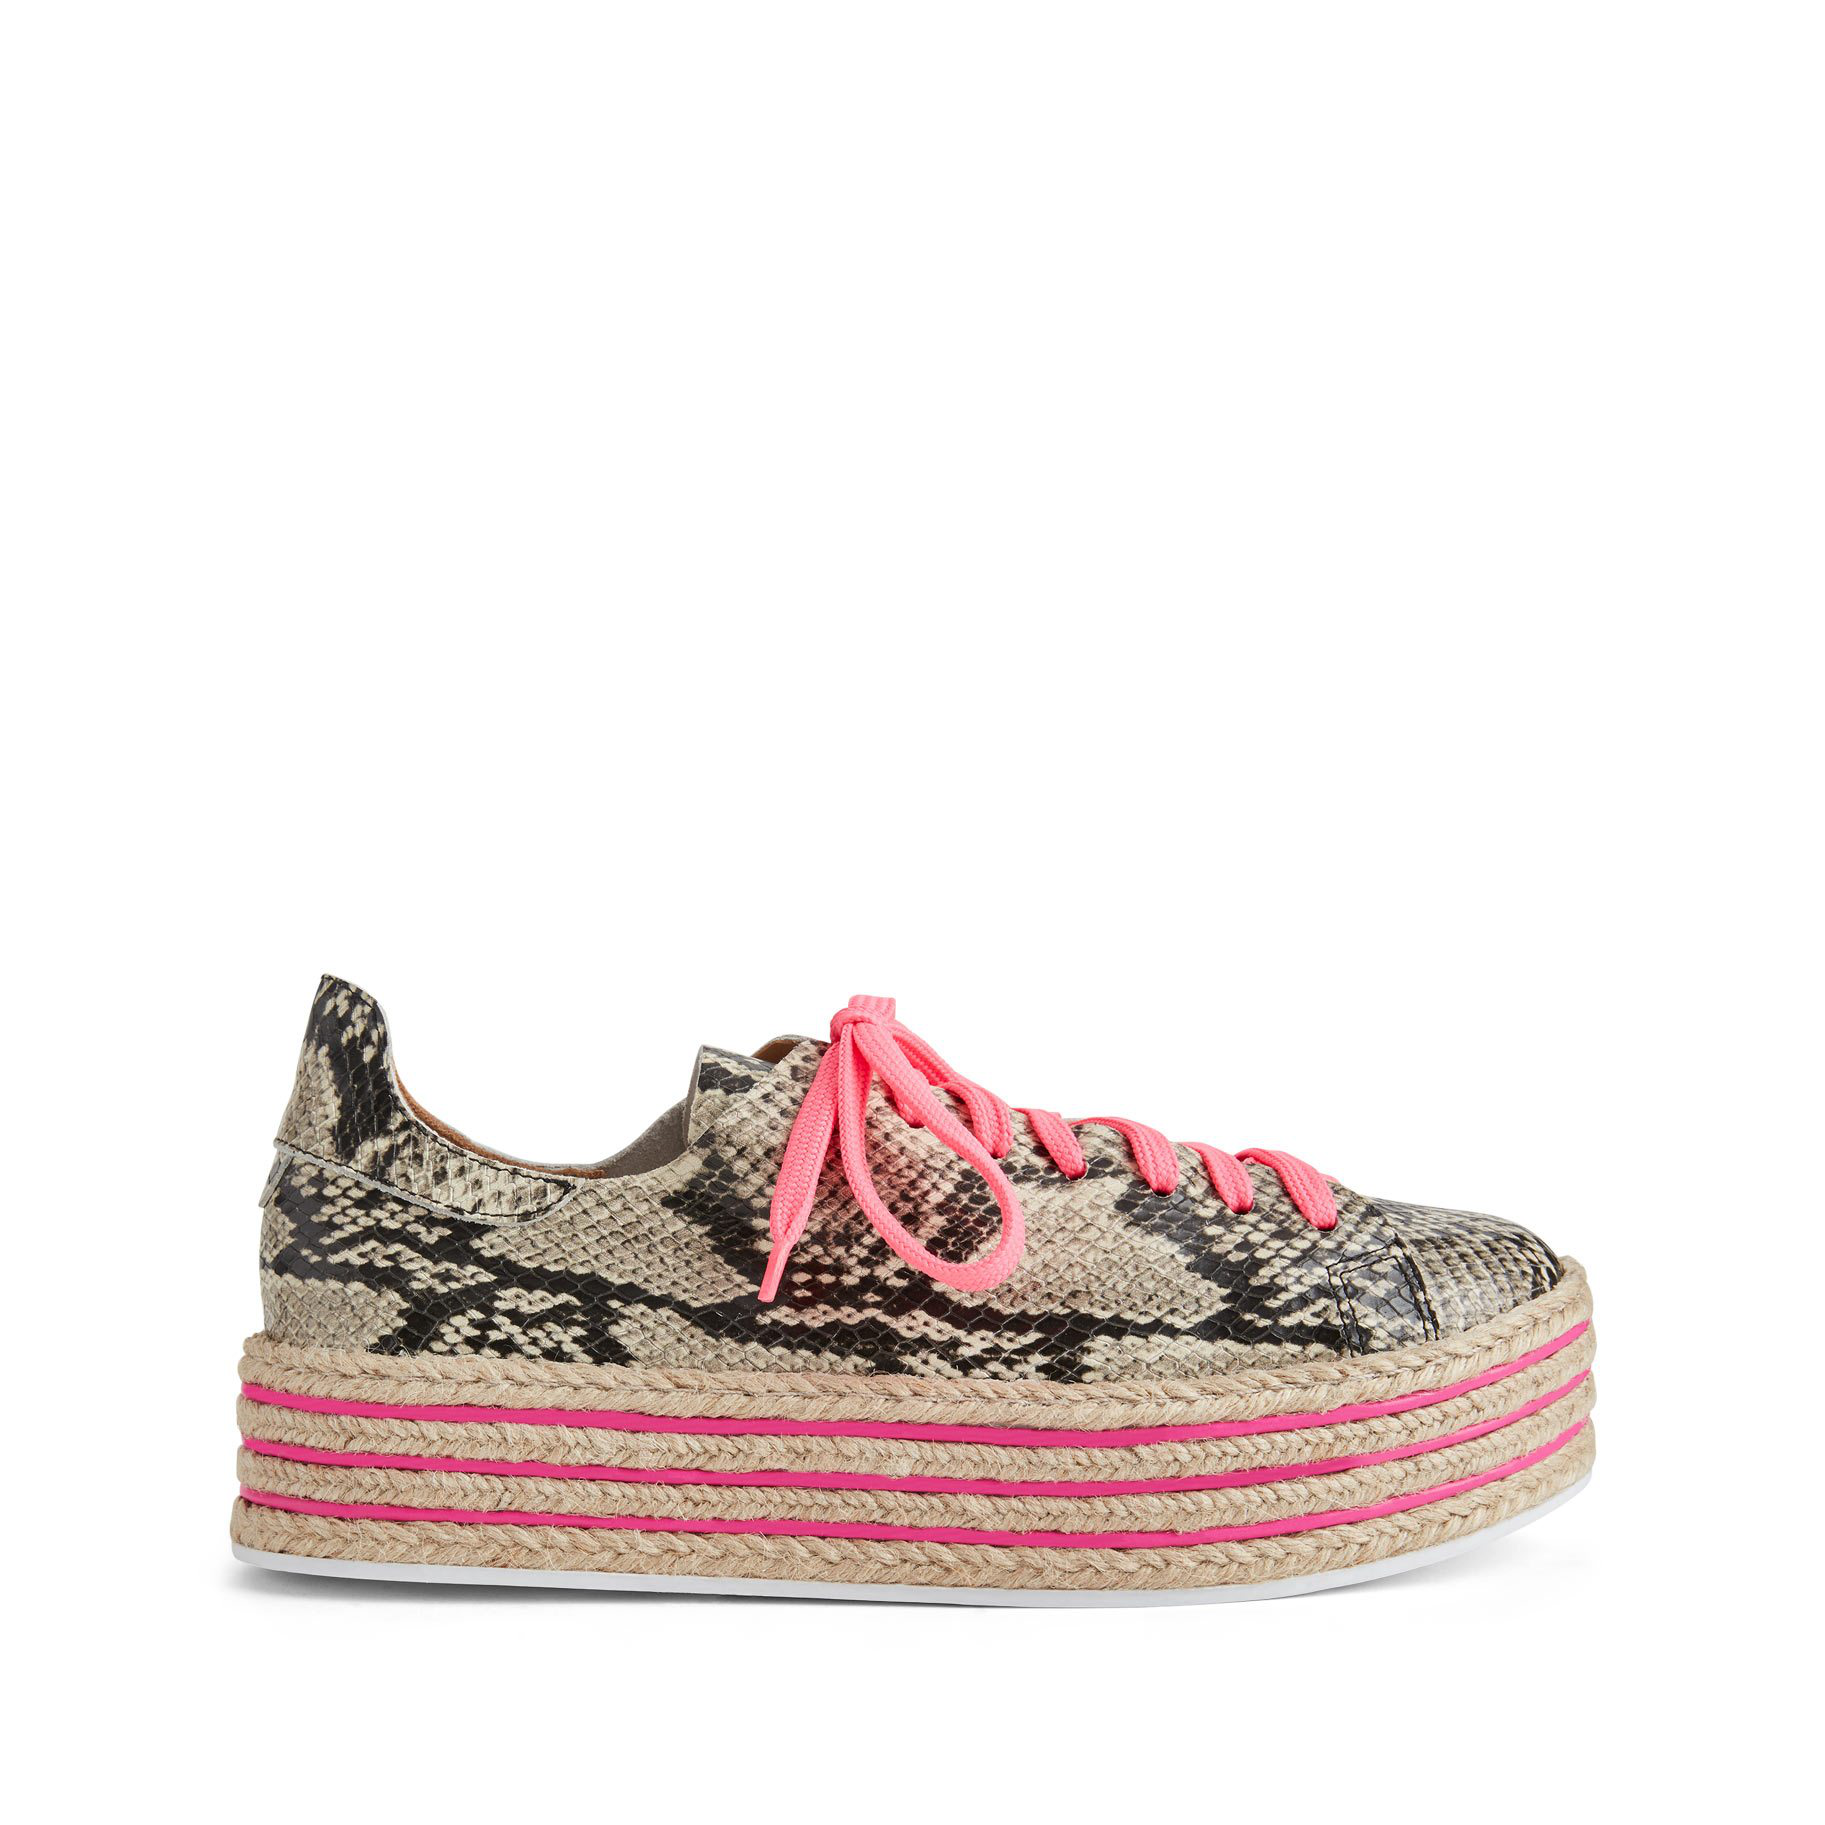 41a1aaedec34 Schutz Demisiana Platform Sneaker In Natural Snake